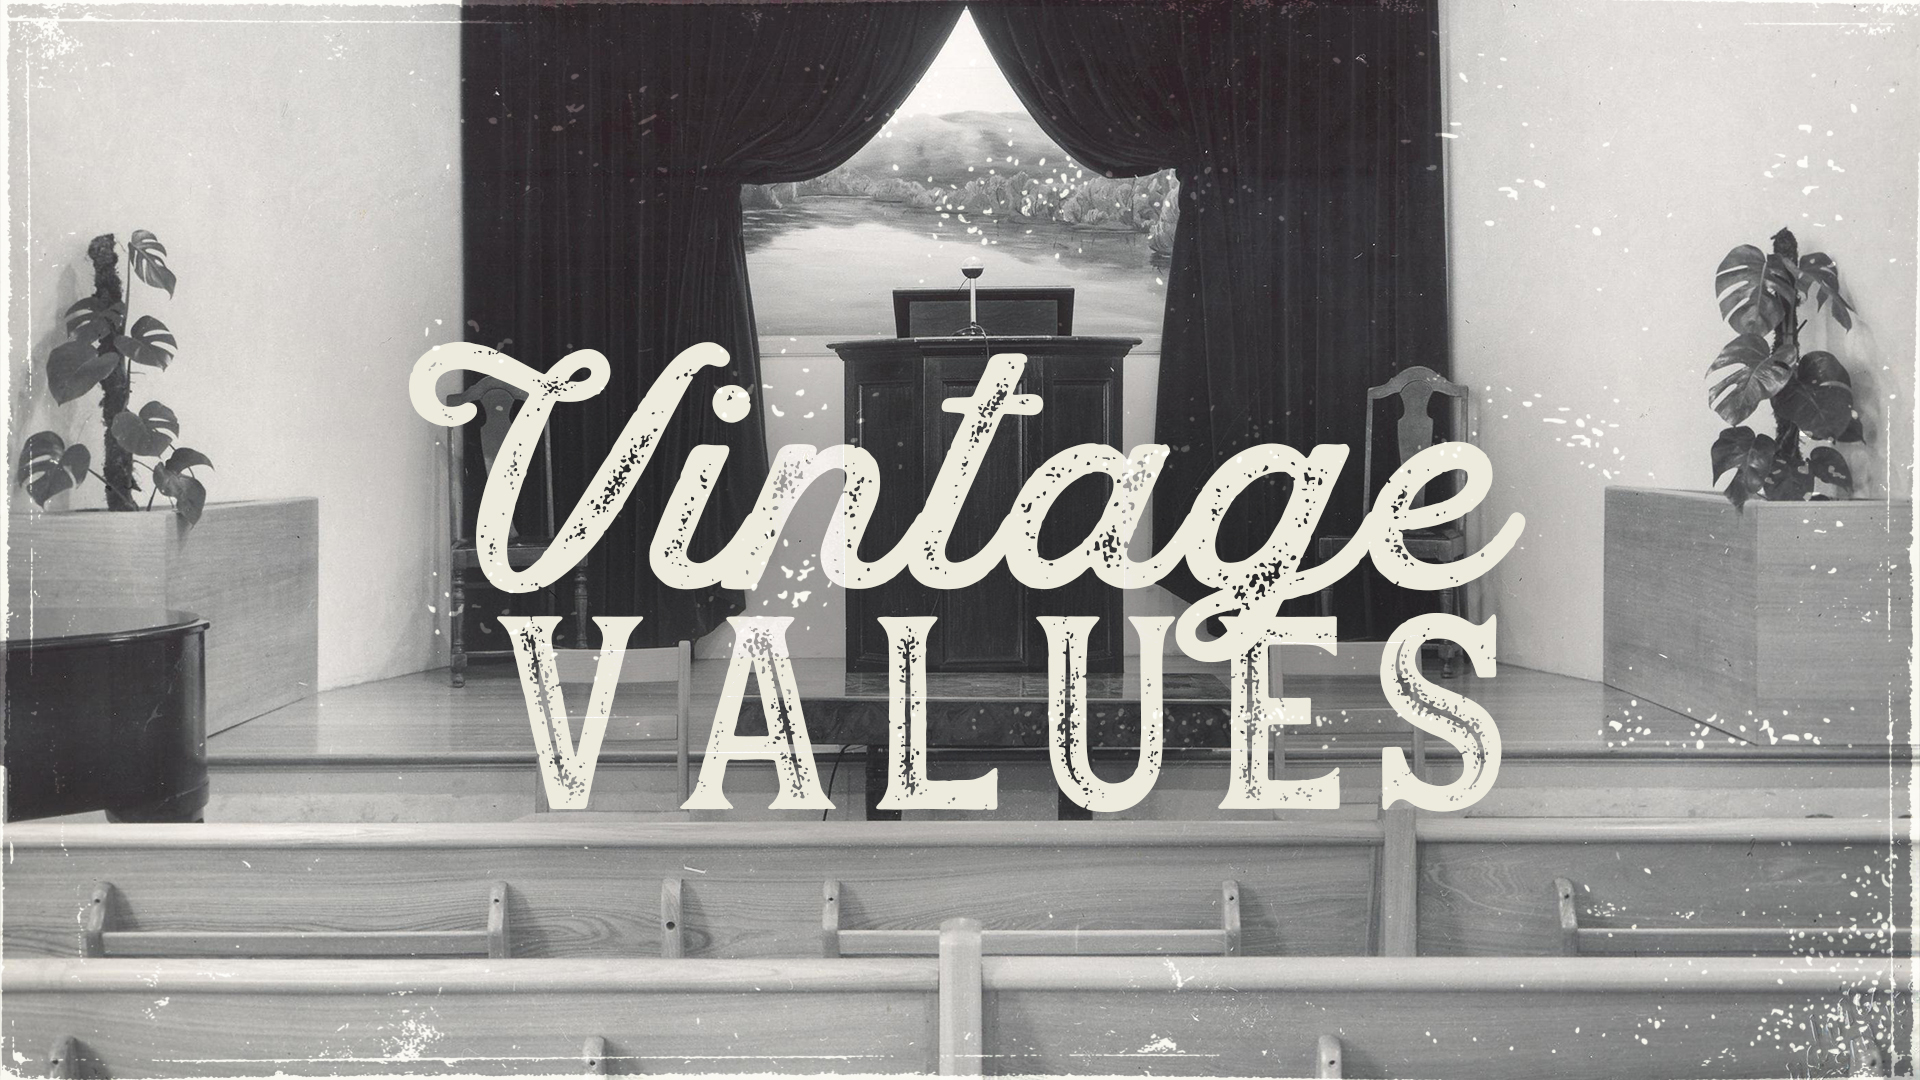 VintageValues2.jpg